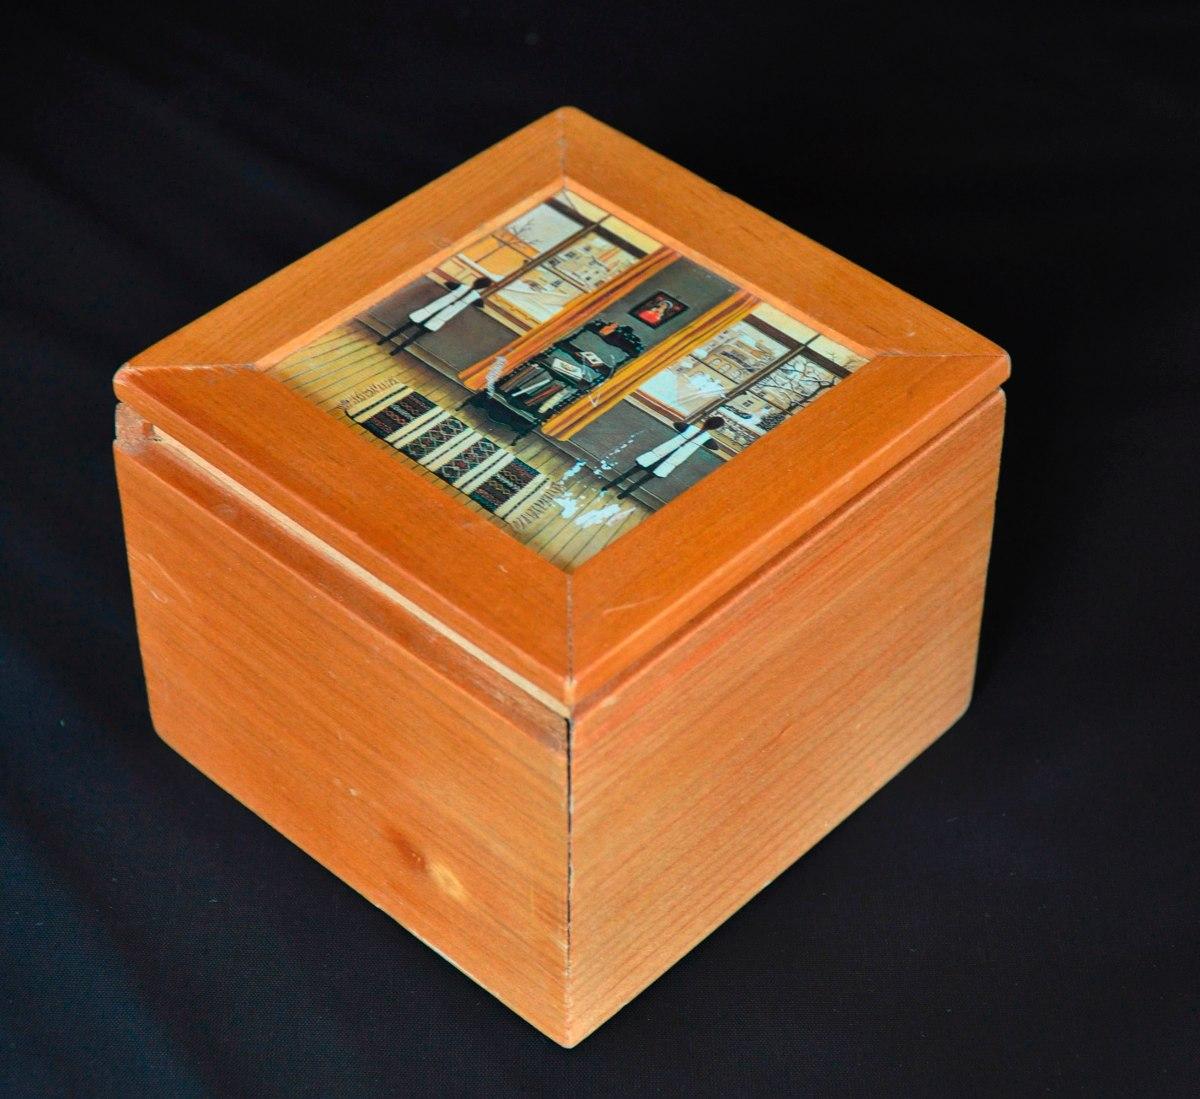 Caja multiuso cuadrada de madera con tapa decorada 12x12 for Caja madera con tapa